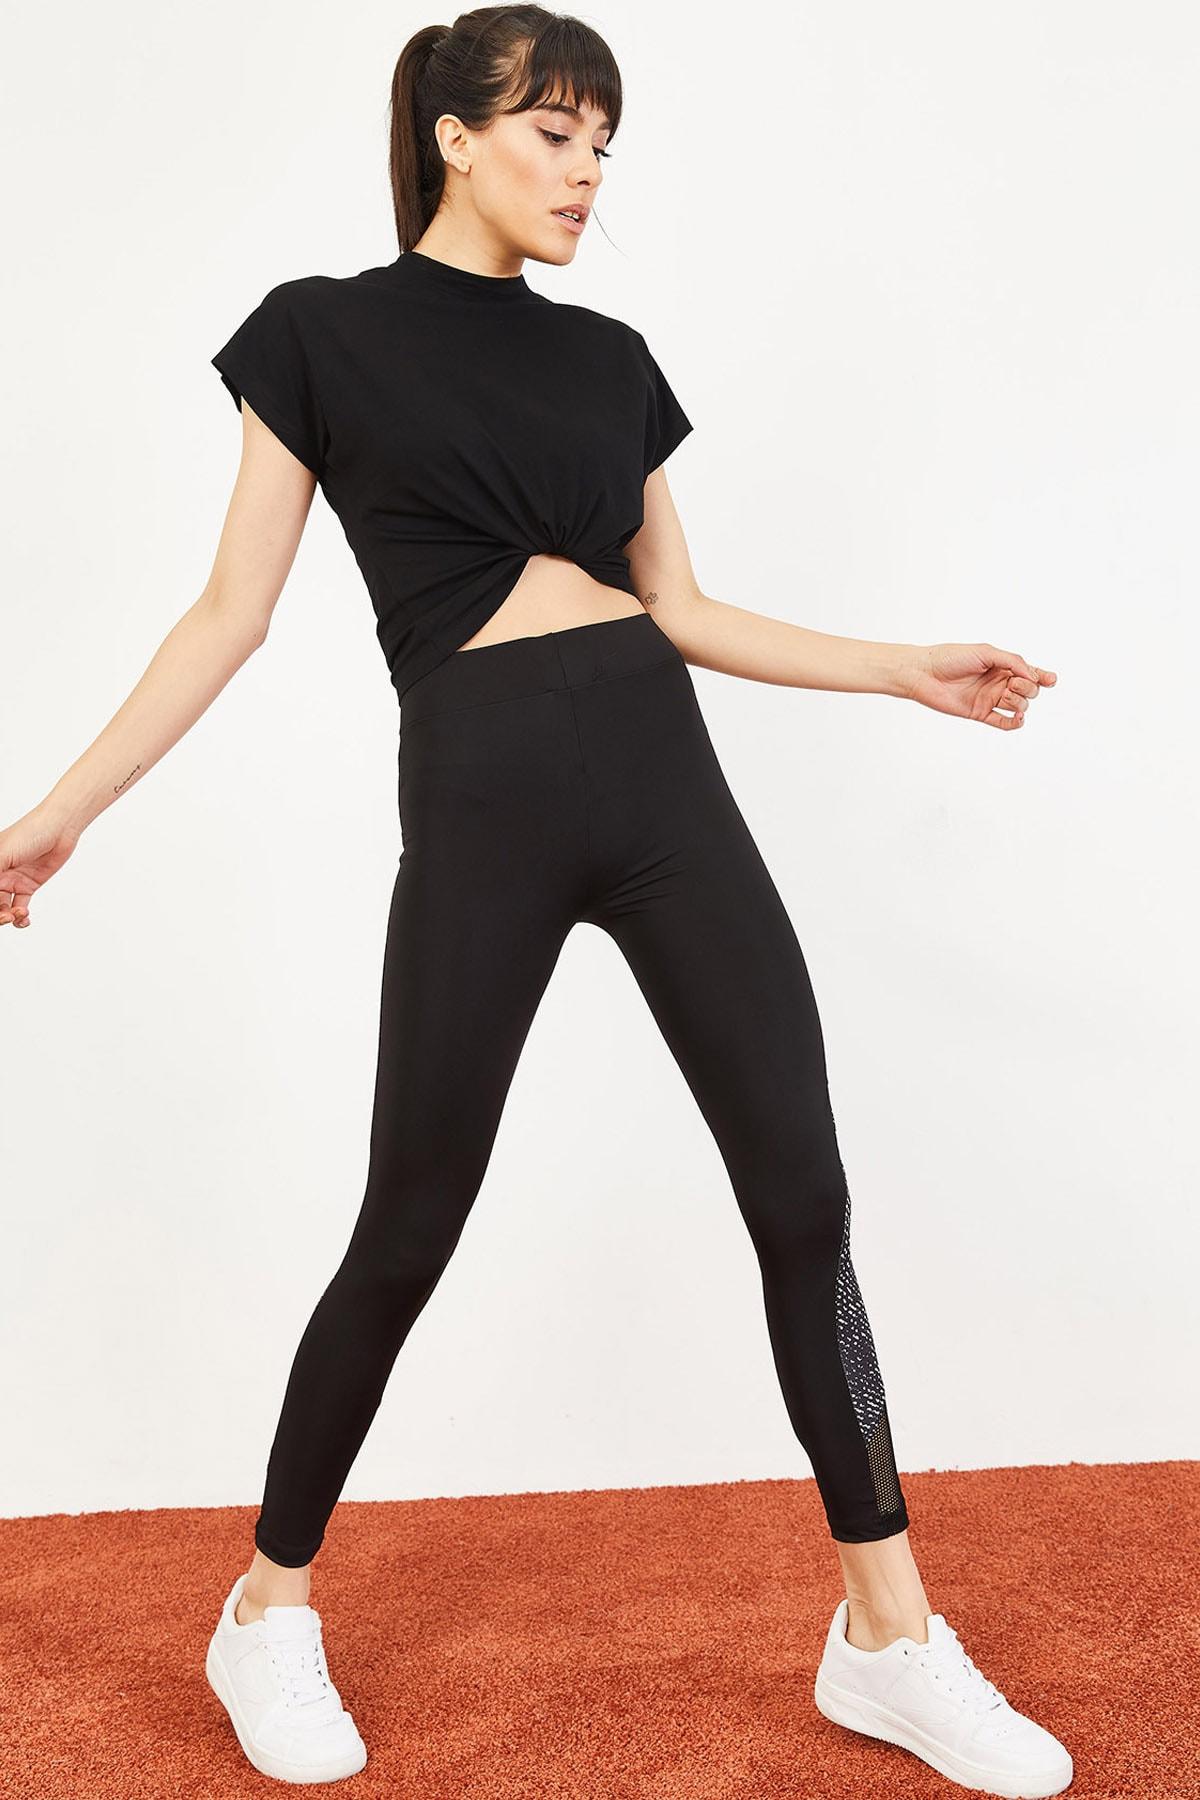 Bianco Lucci Kadın Diz Altı Digital Baskı Çapraz Tül Spor Tayt Siyah 10051056 3